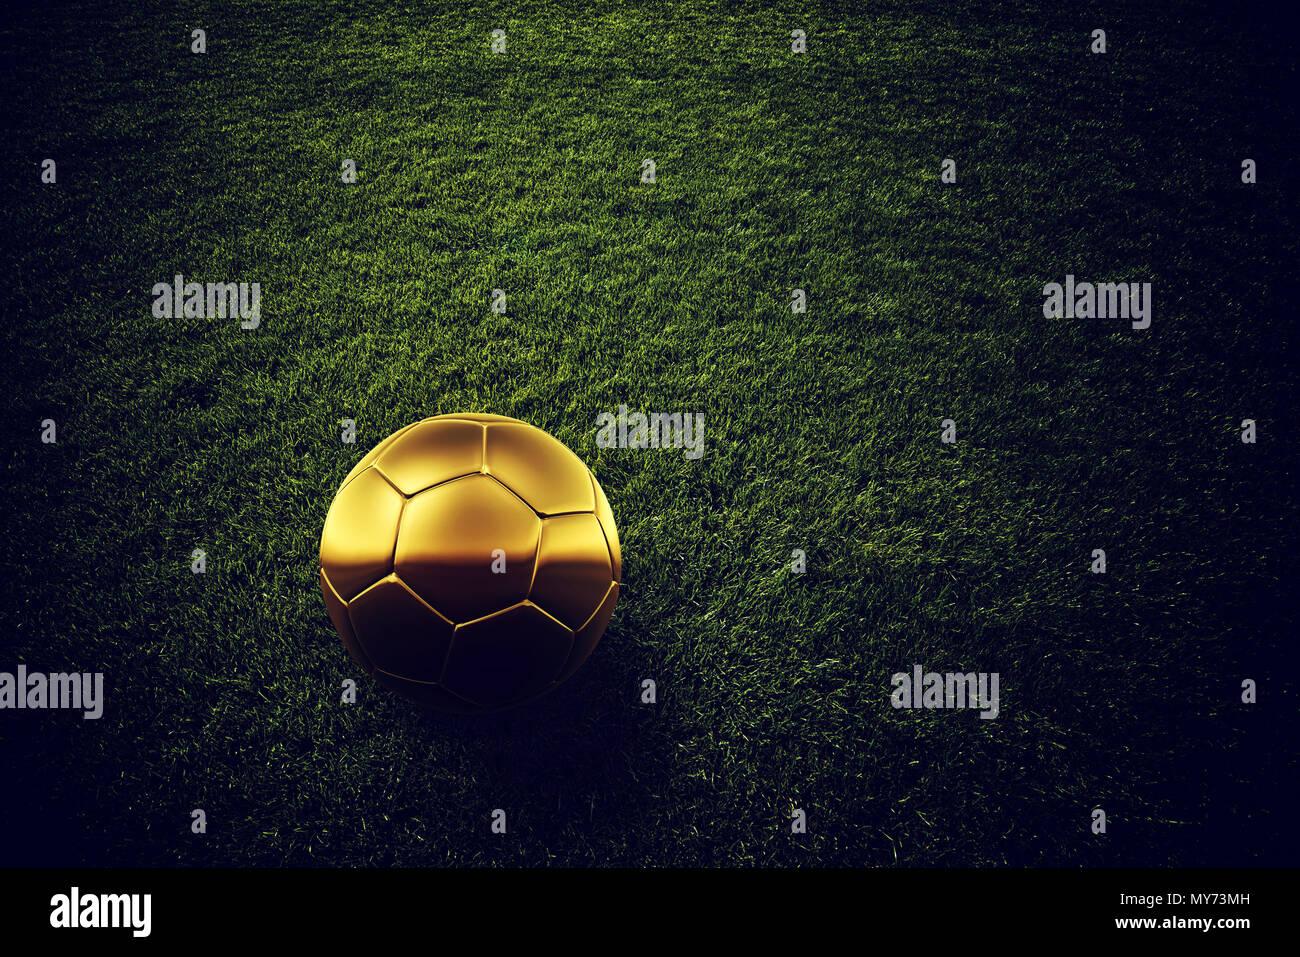 5f5322dd9 Golden soccer ball on football pitch grass, 3d rendering illustration